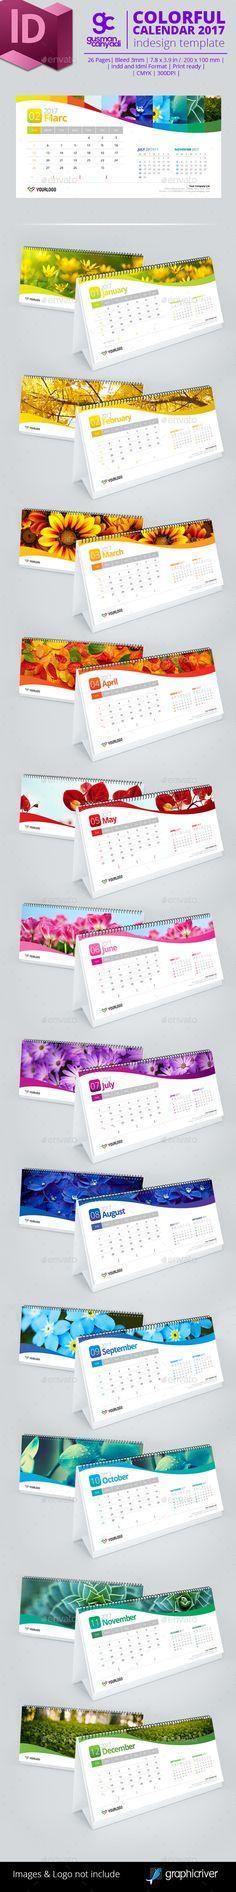 Desk Calendar for 2015 ready for print Desks, Desk calendars and